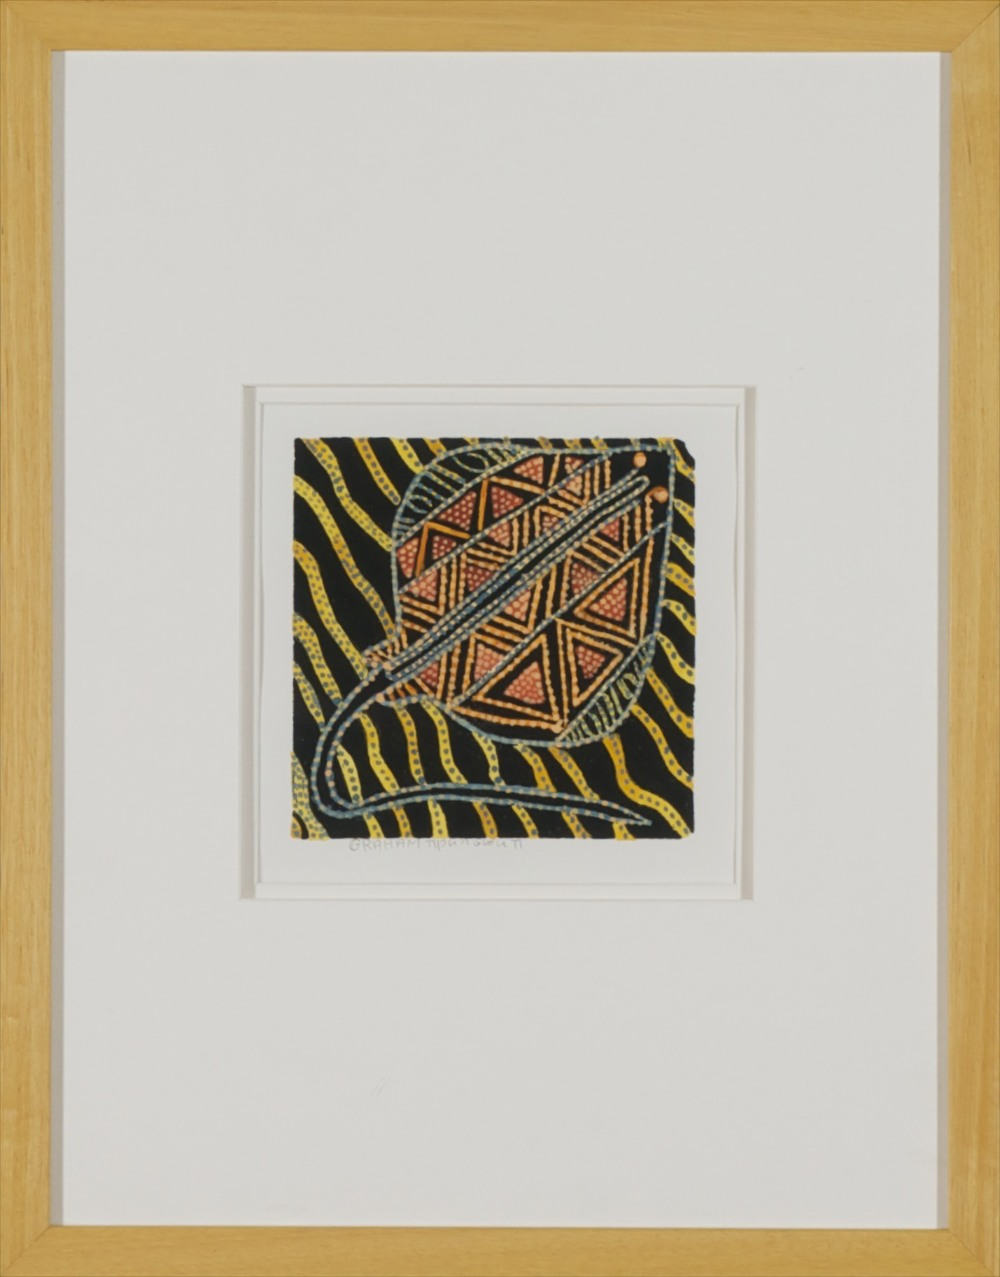 #13105 Graham Tipunguruti 'Stingray' 48cm x 37cm Was $395 Now $197.50